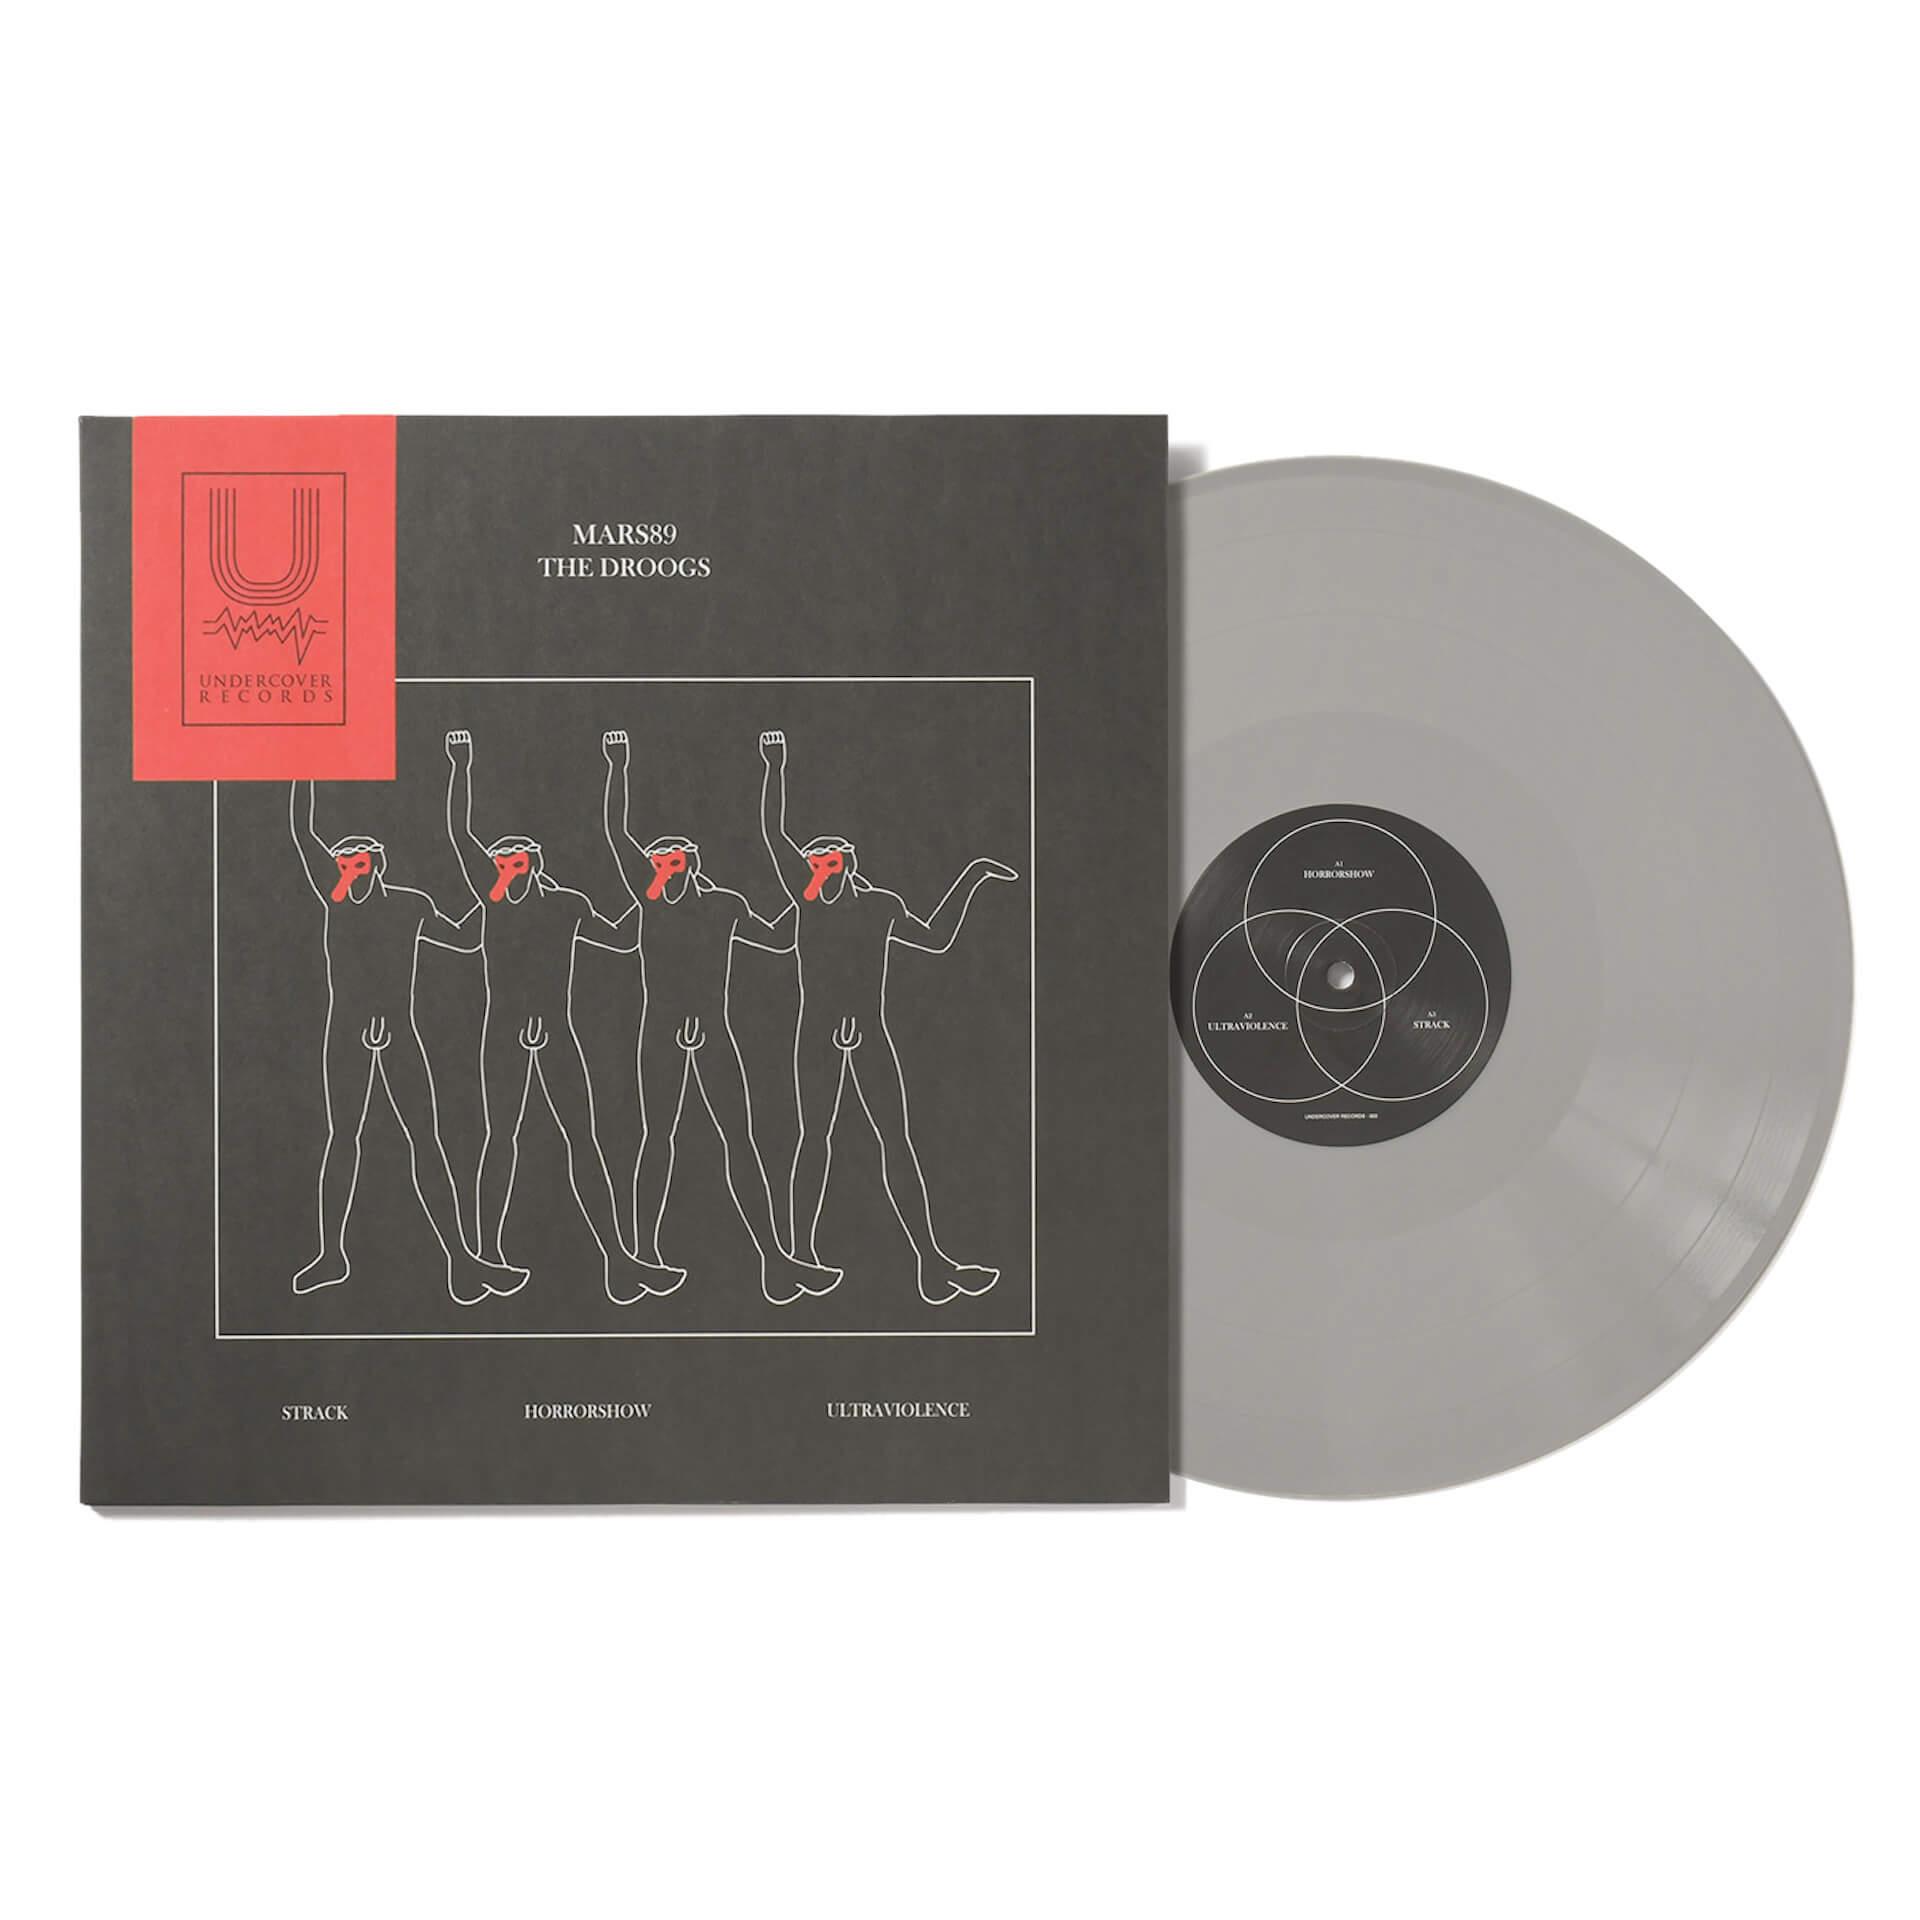 UNDERCOVERのレーベルからリリースのMars89のアルバム『THE DROOGS』リリース・パーティが WWWXで開催決定! music191227_mars89thedrooksparty_02